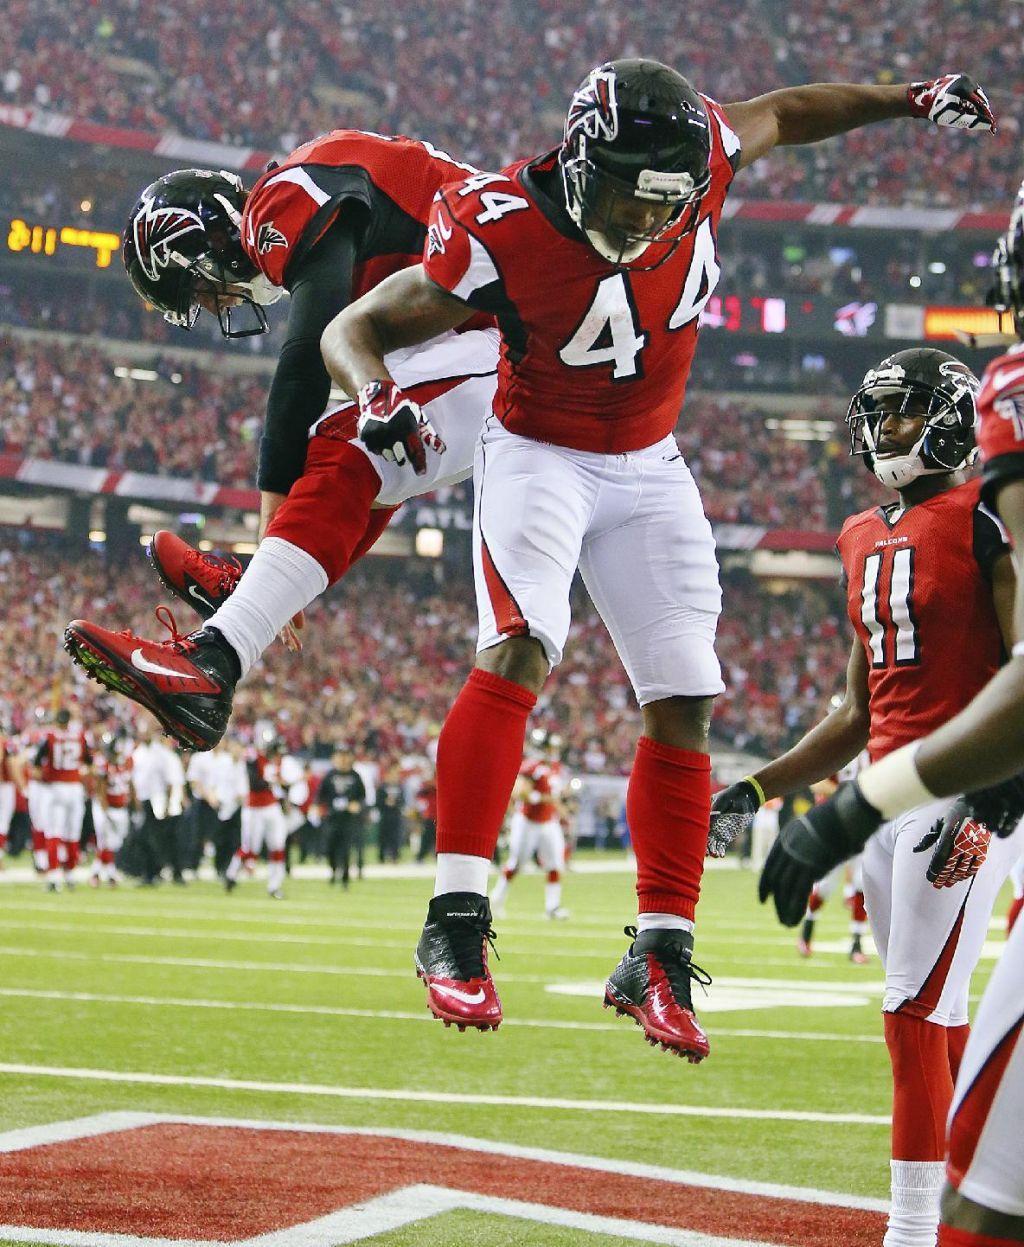 Image Detail For Atlanta Falcons Quarterback Matt Ryan Left Celebrates With Running Back Jaso Atlanta Falcons Football Atlanta Falcons Fans Falcons Football